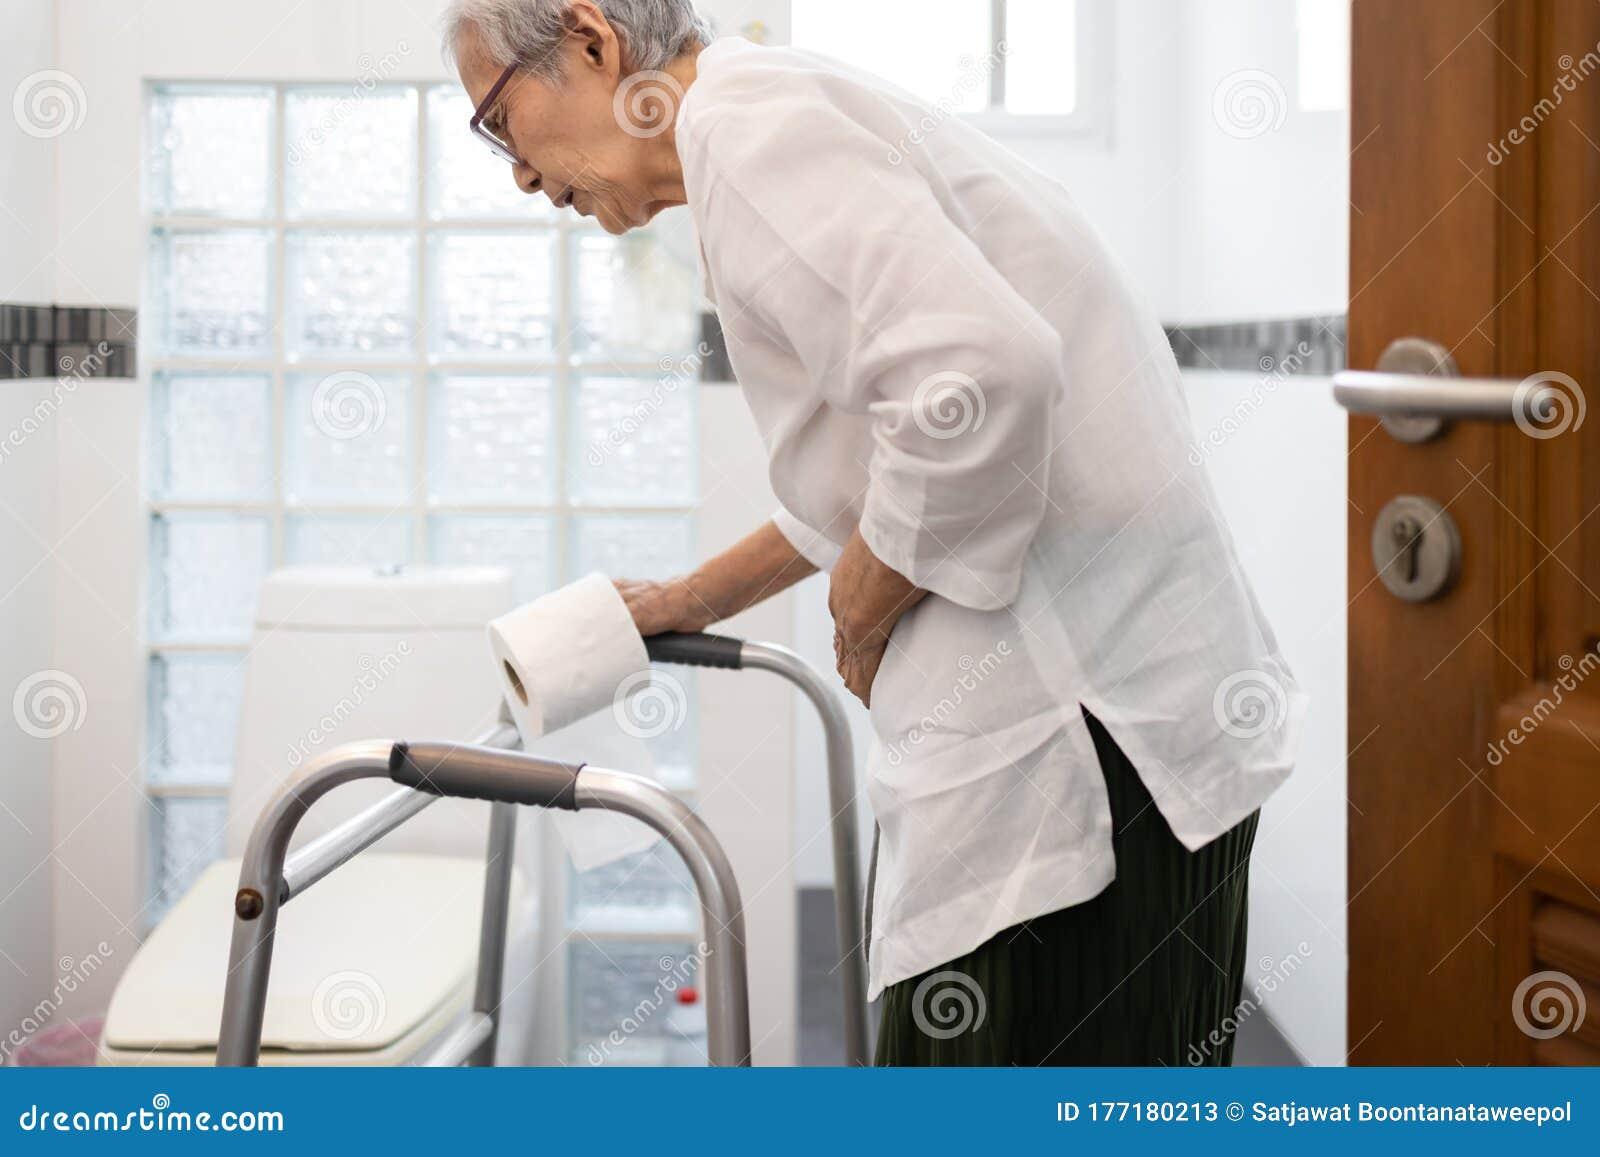 Senior Woman With Diarrhea Holding Tissue Roll Near A ...